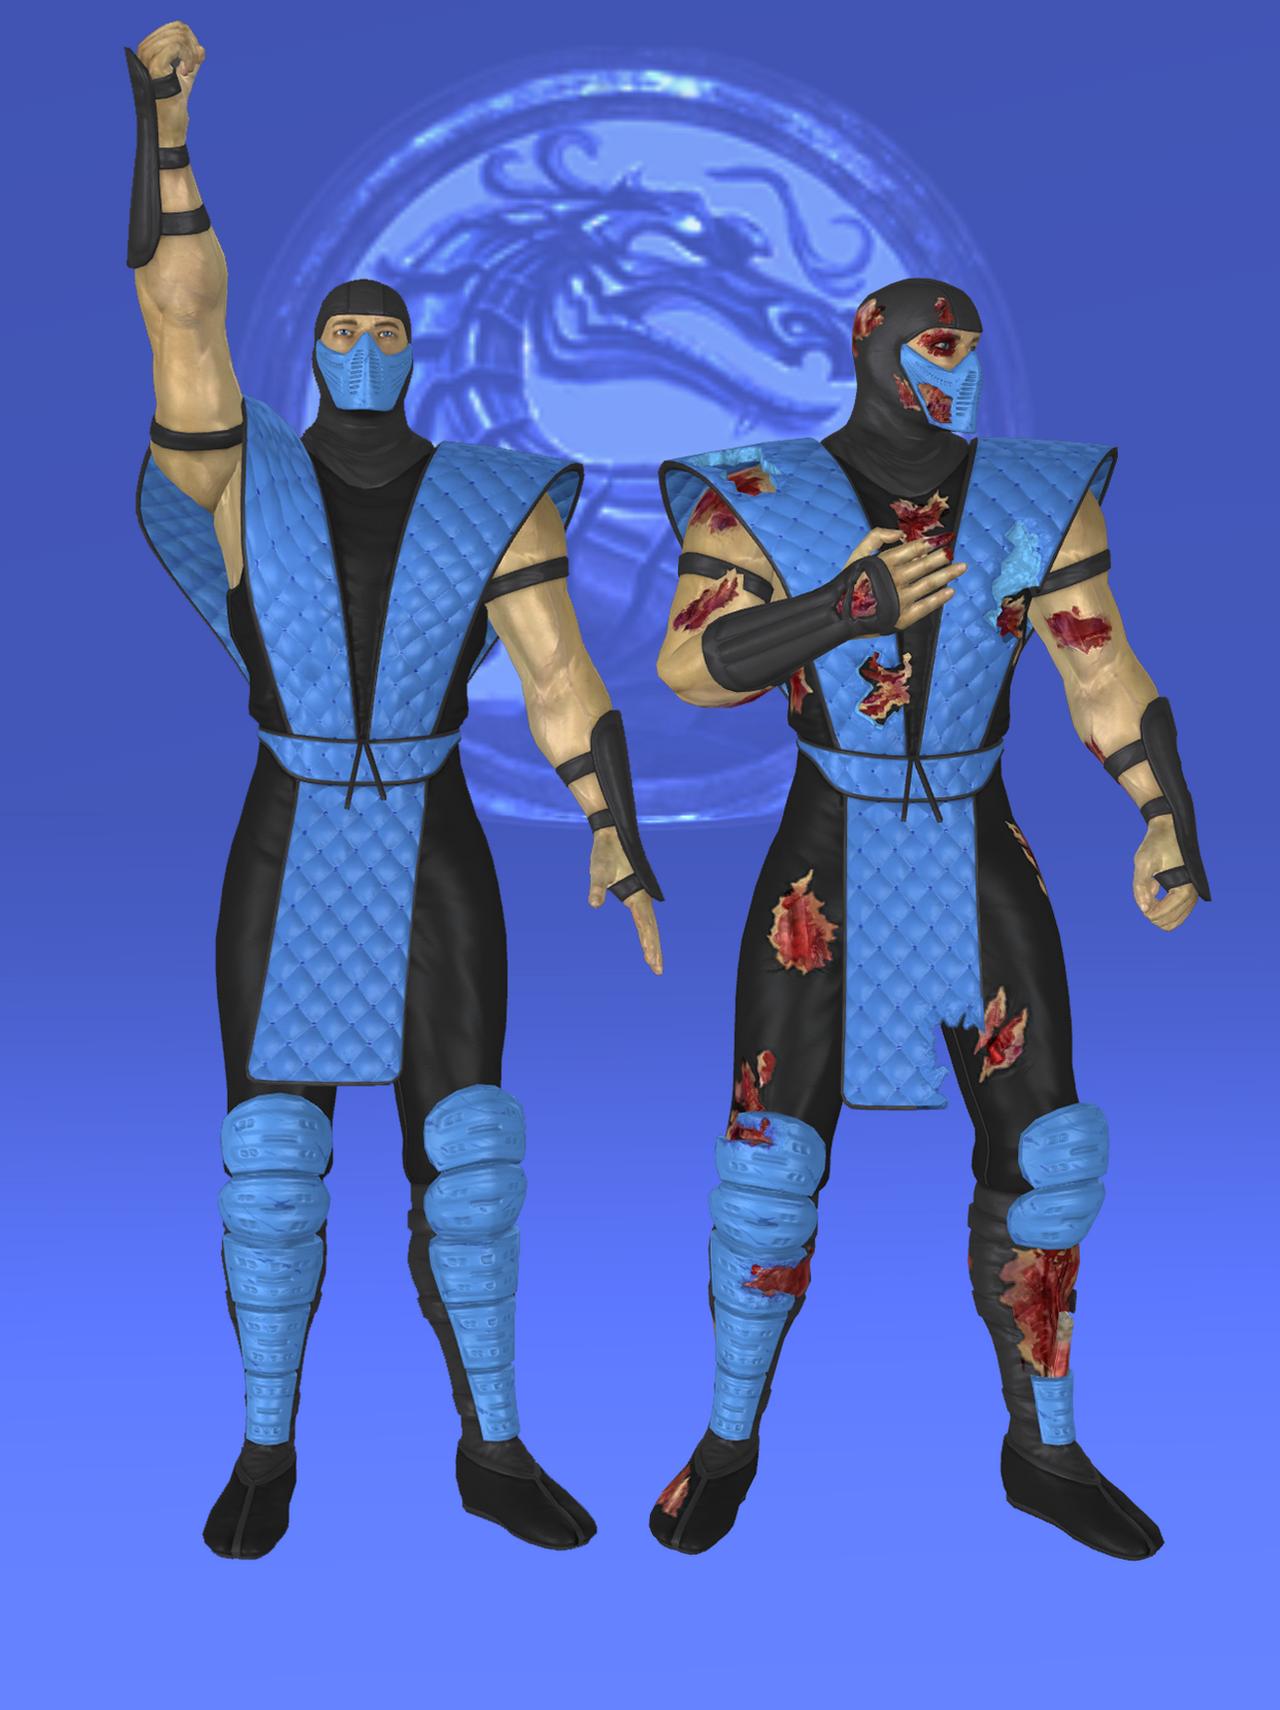 mortal kombat 9 how to change costumes